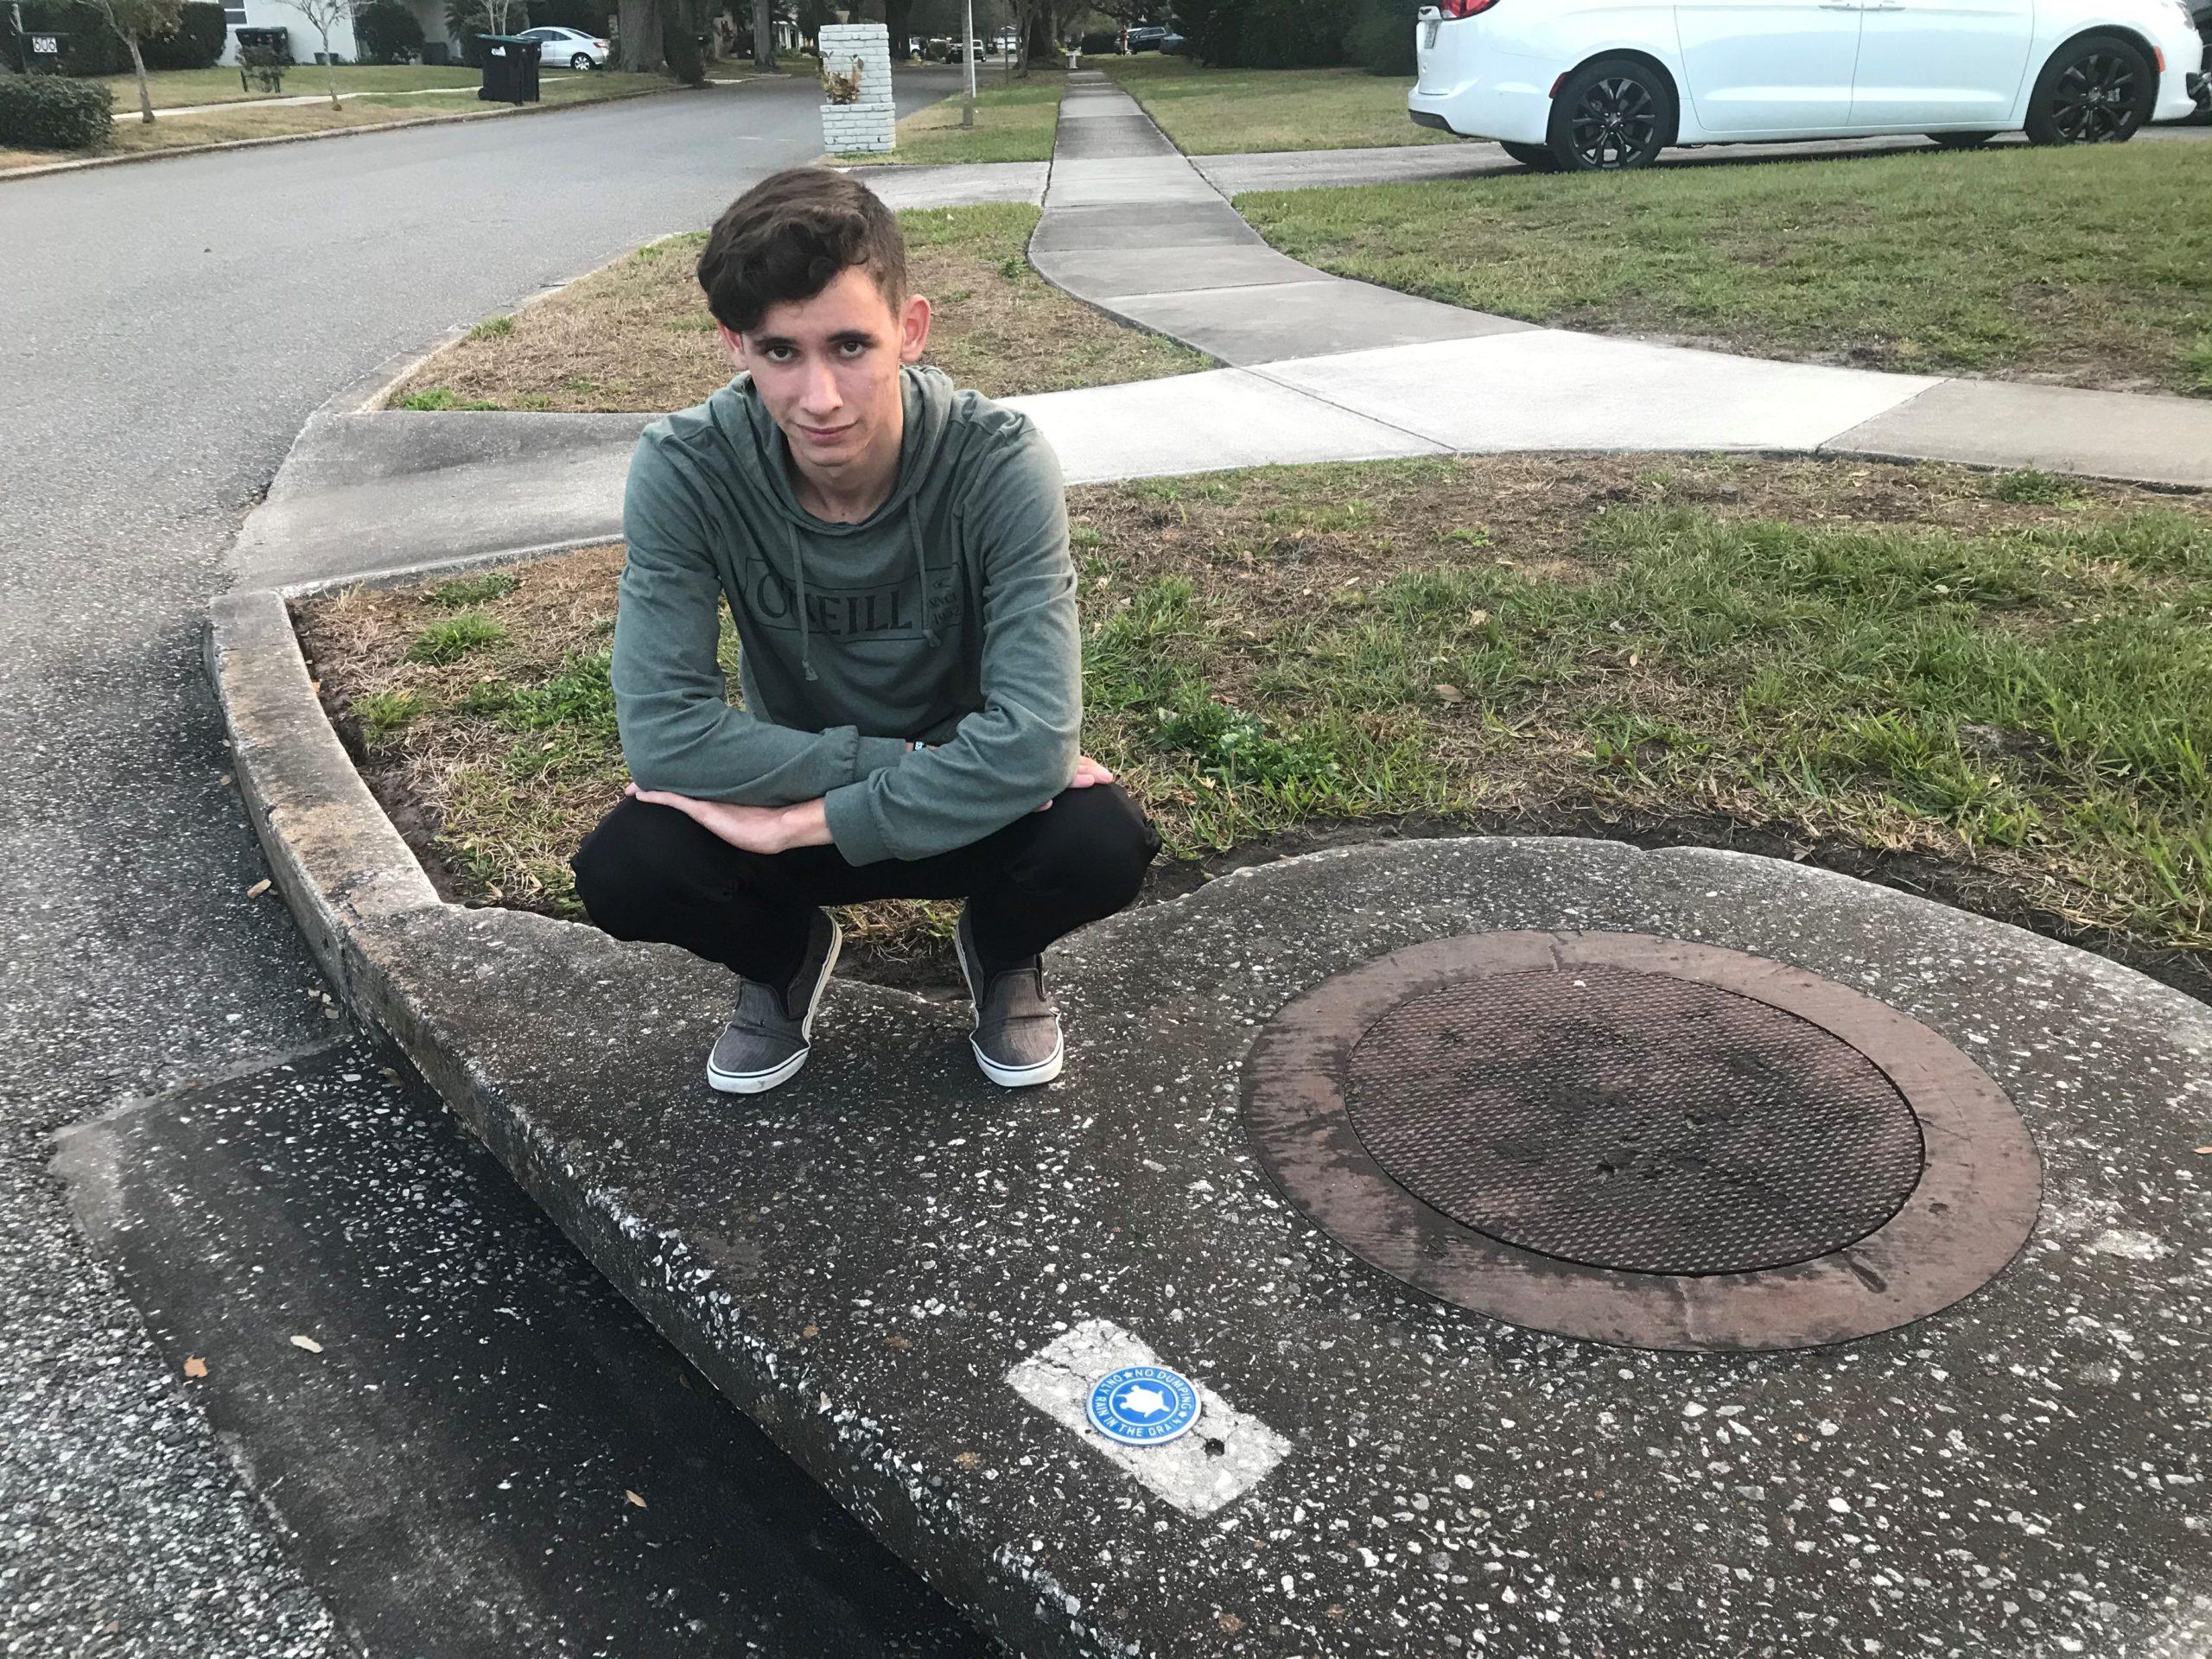 High school student installing a drain label.